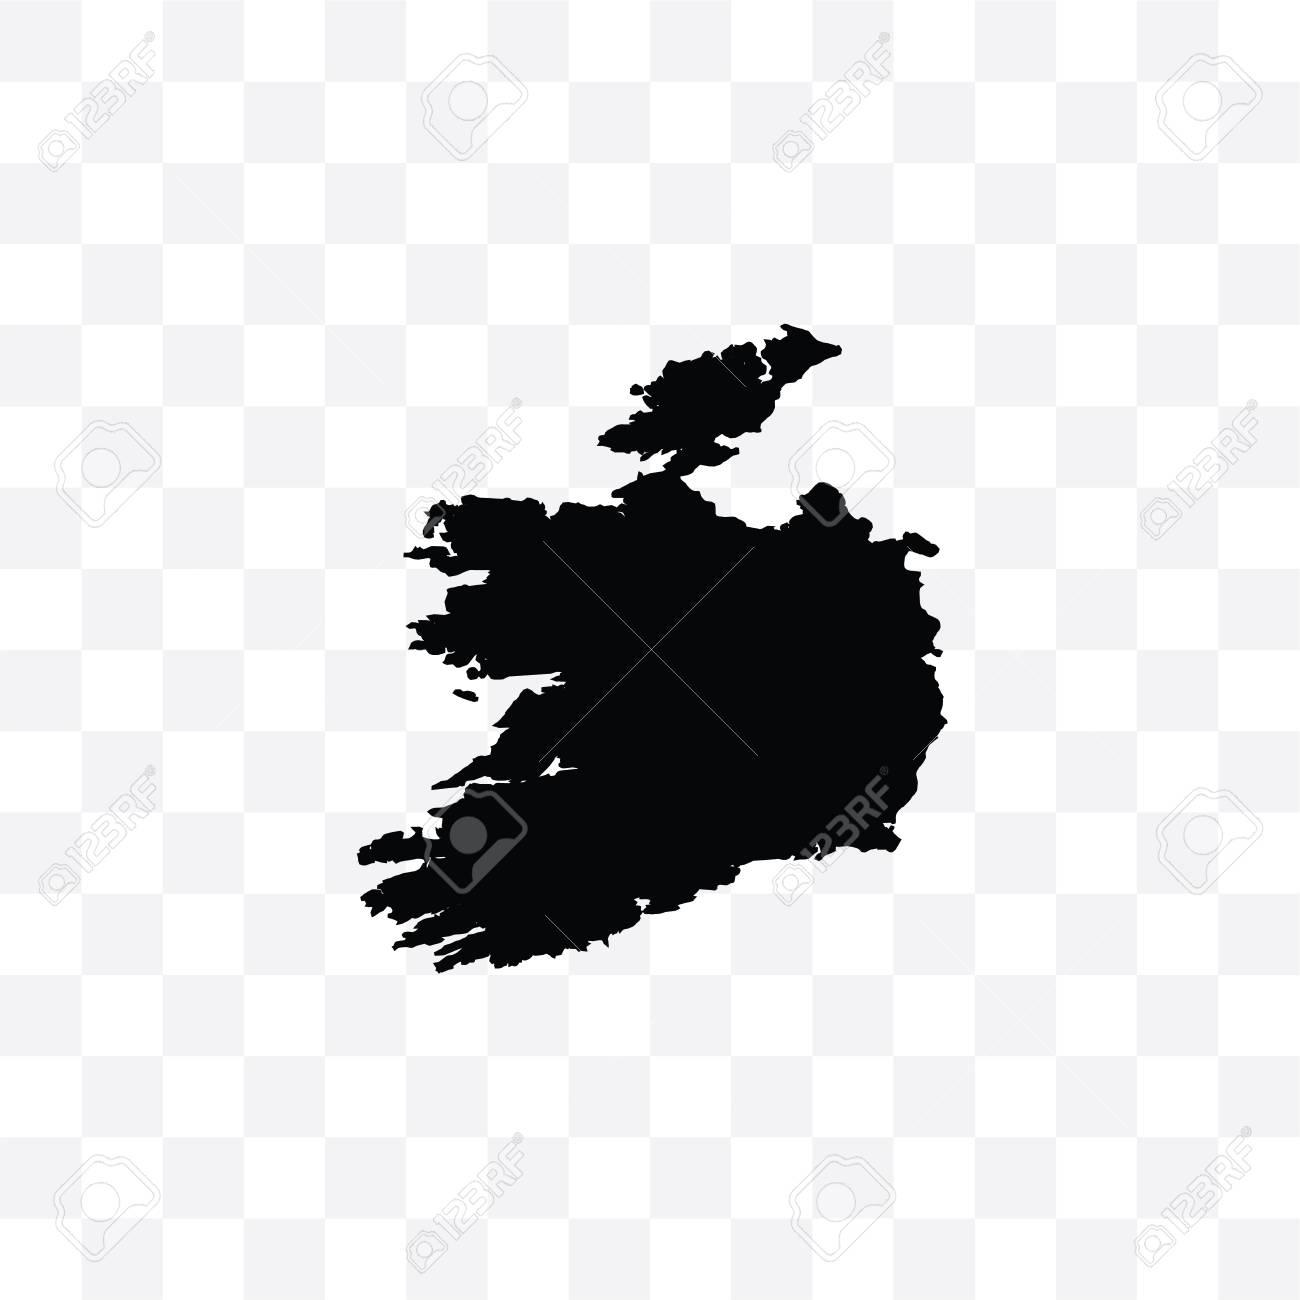 Ireland Country Shape